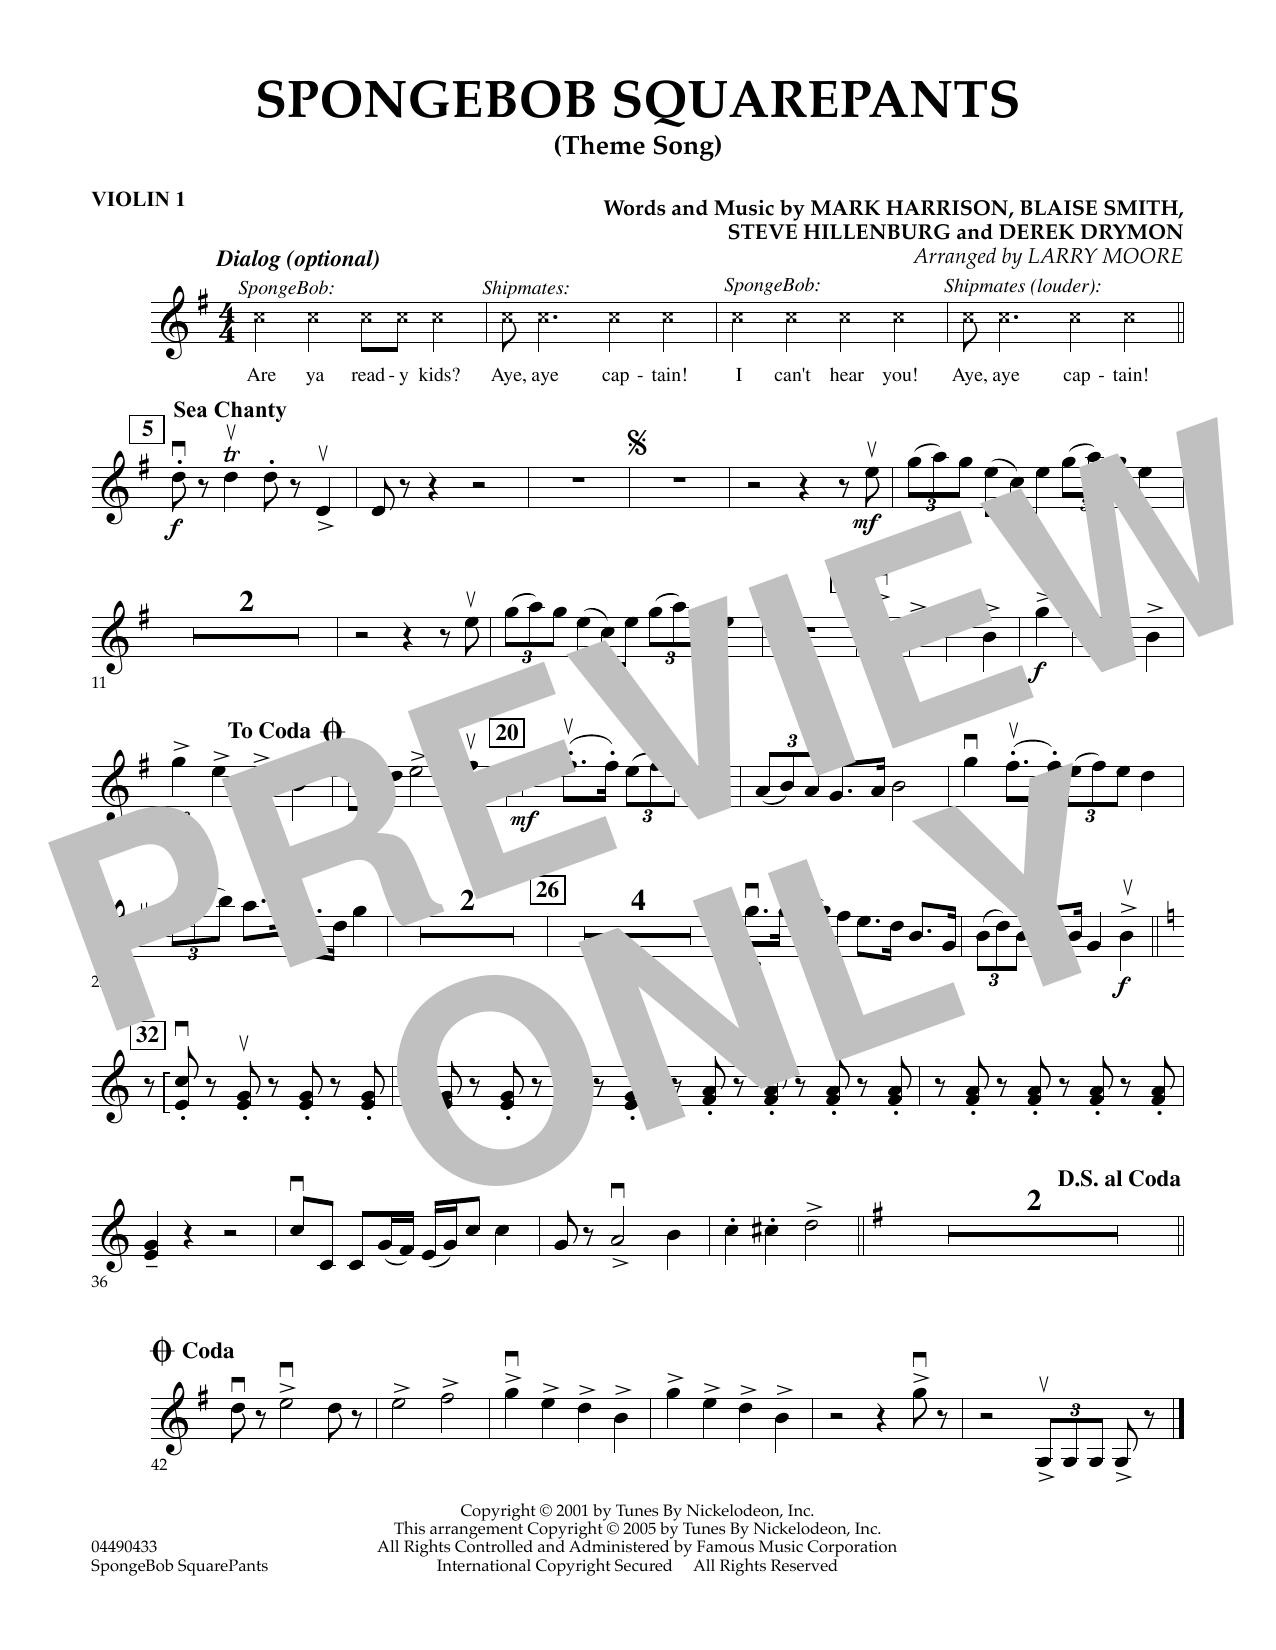 SpongeBob SquarePants (Theme Song) - Violin 1 by Larry Moore Orchestra  Digital Sheet Music